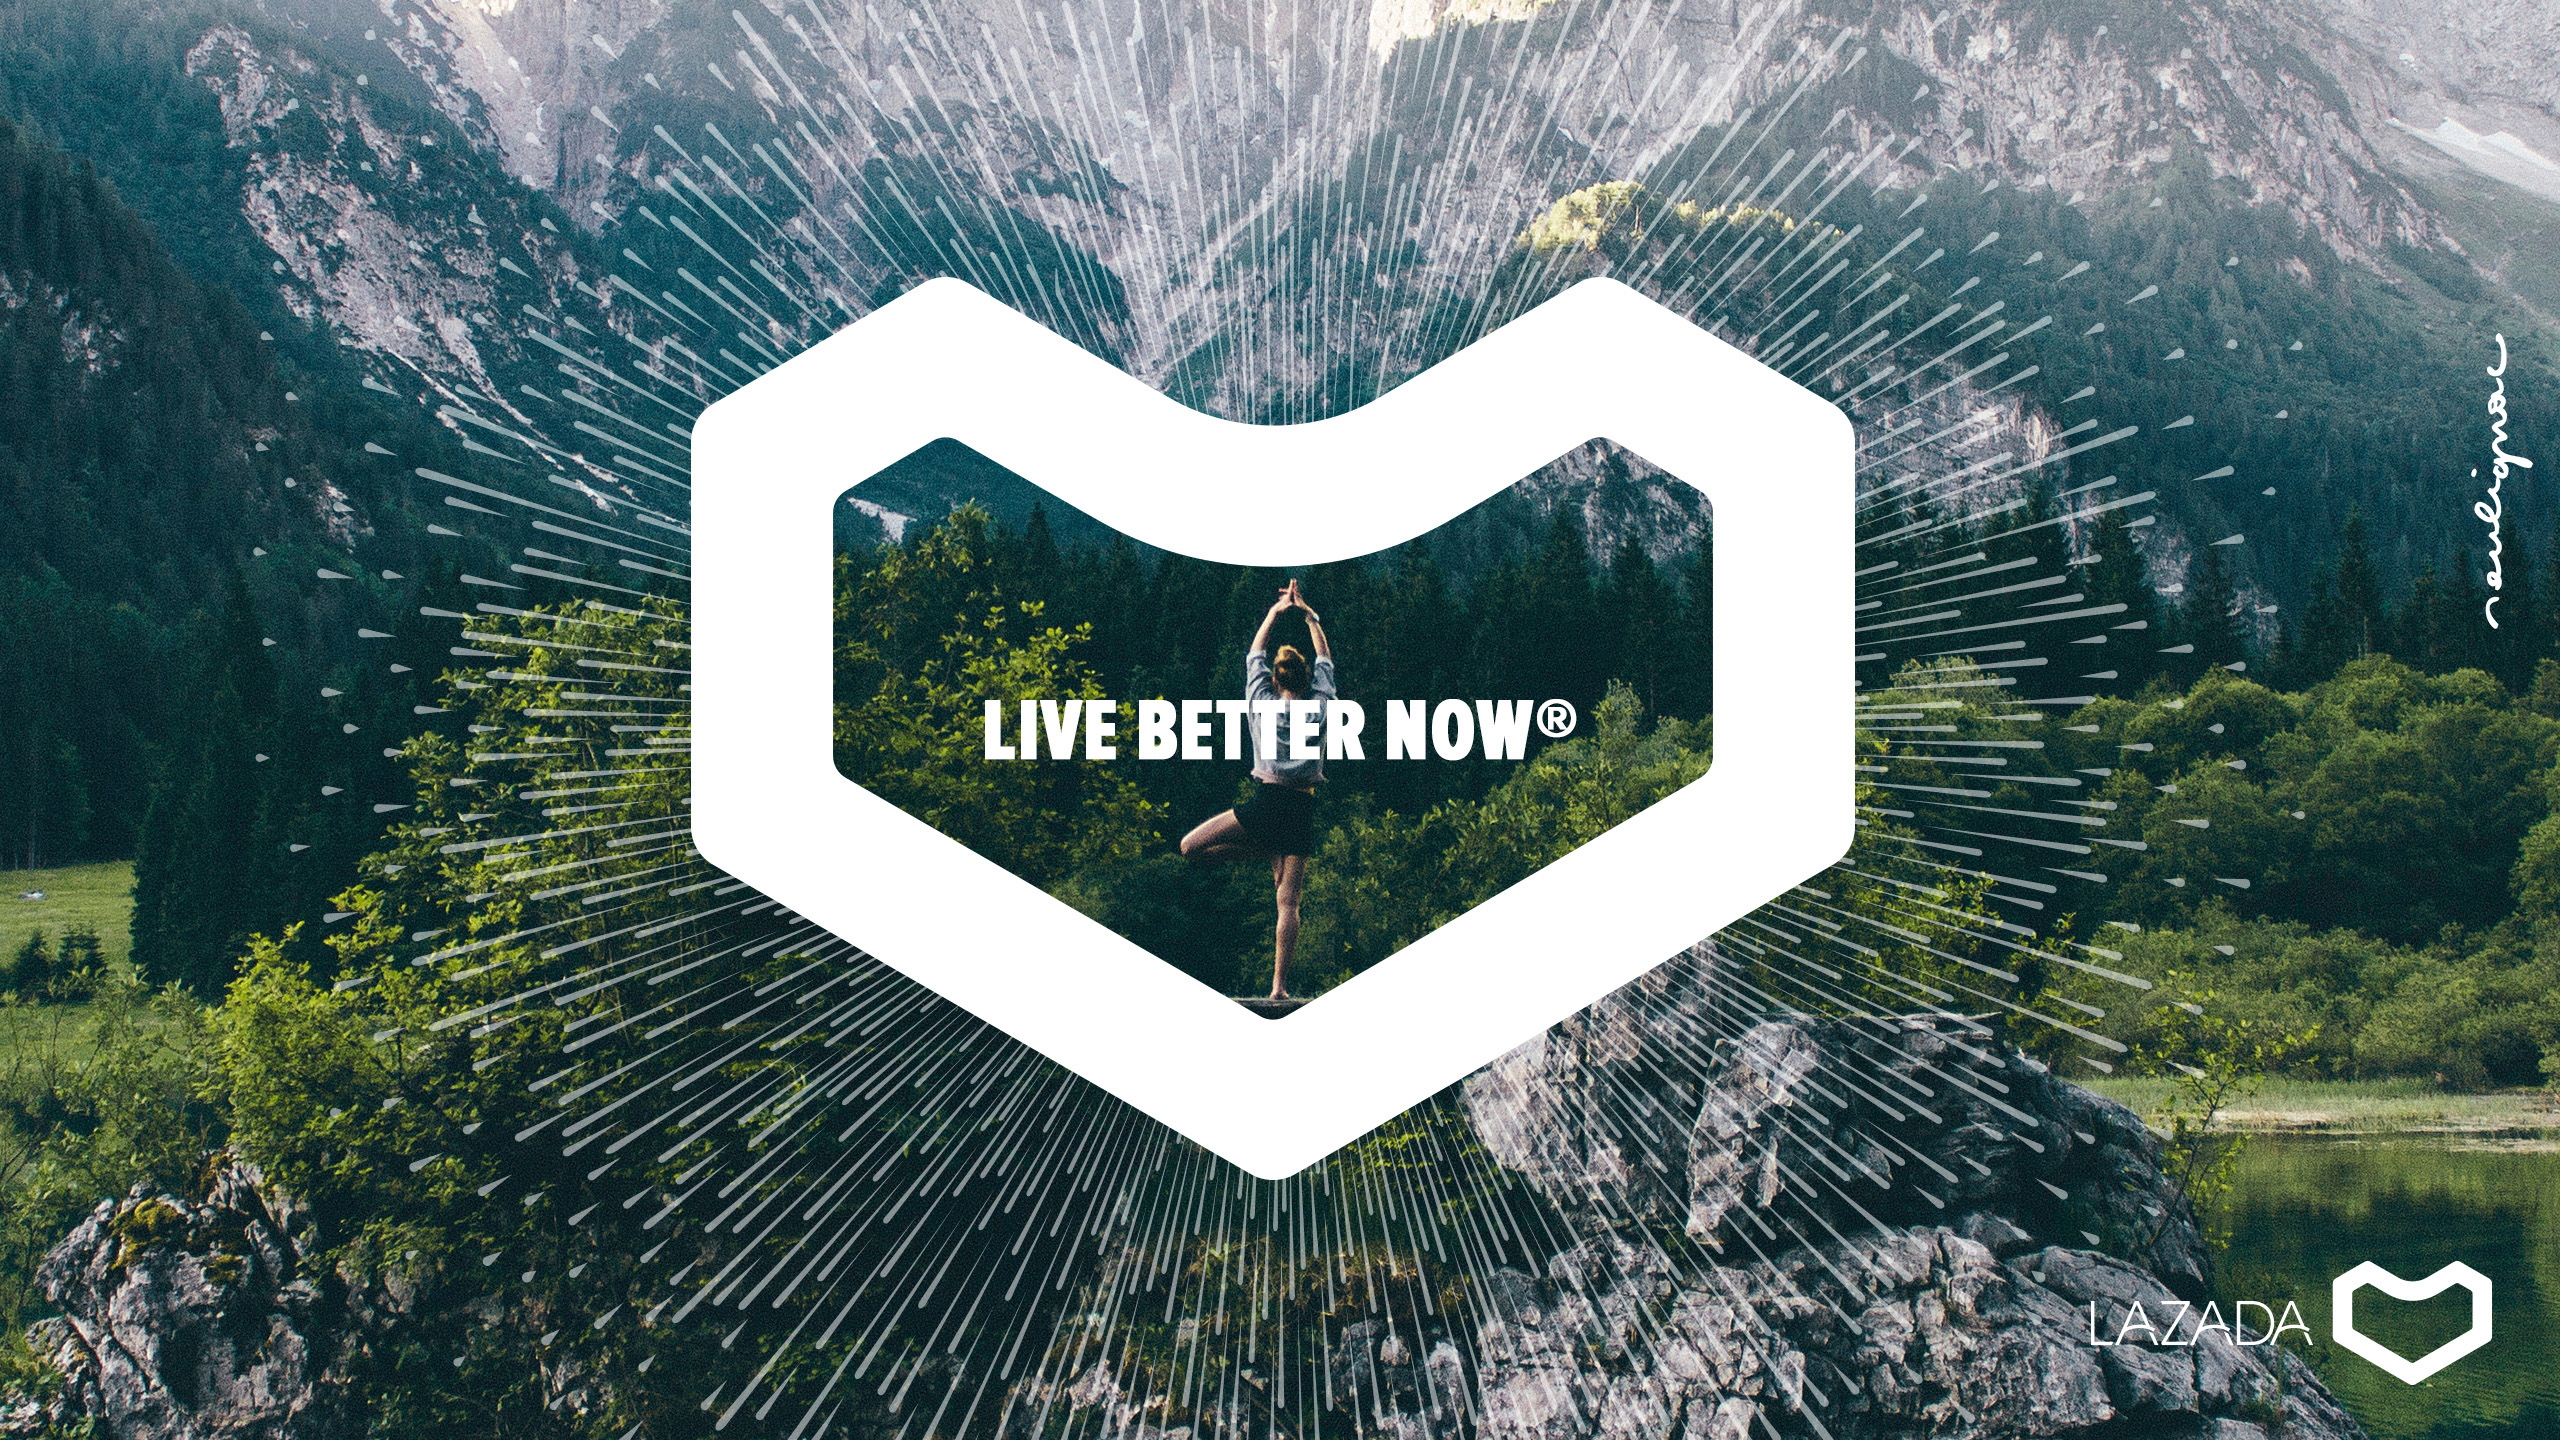 Lazada Group - Digital Campaign - LIVE BETTER NOW - Francois Soulignac - Digital Creative & Art Director - MADJOR Labbrand Shanghai